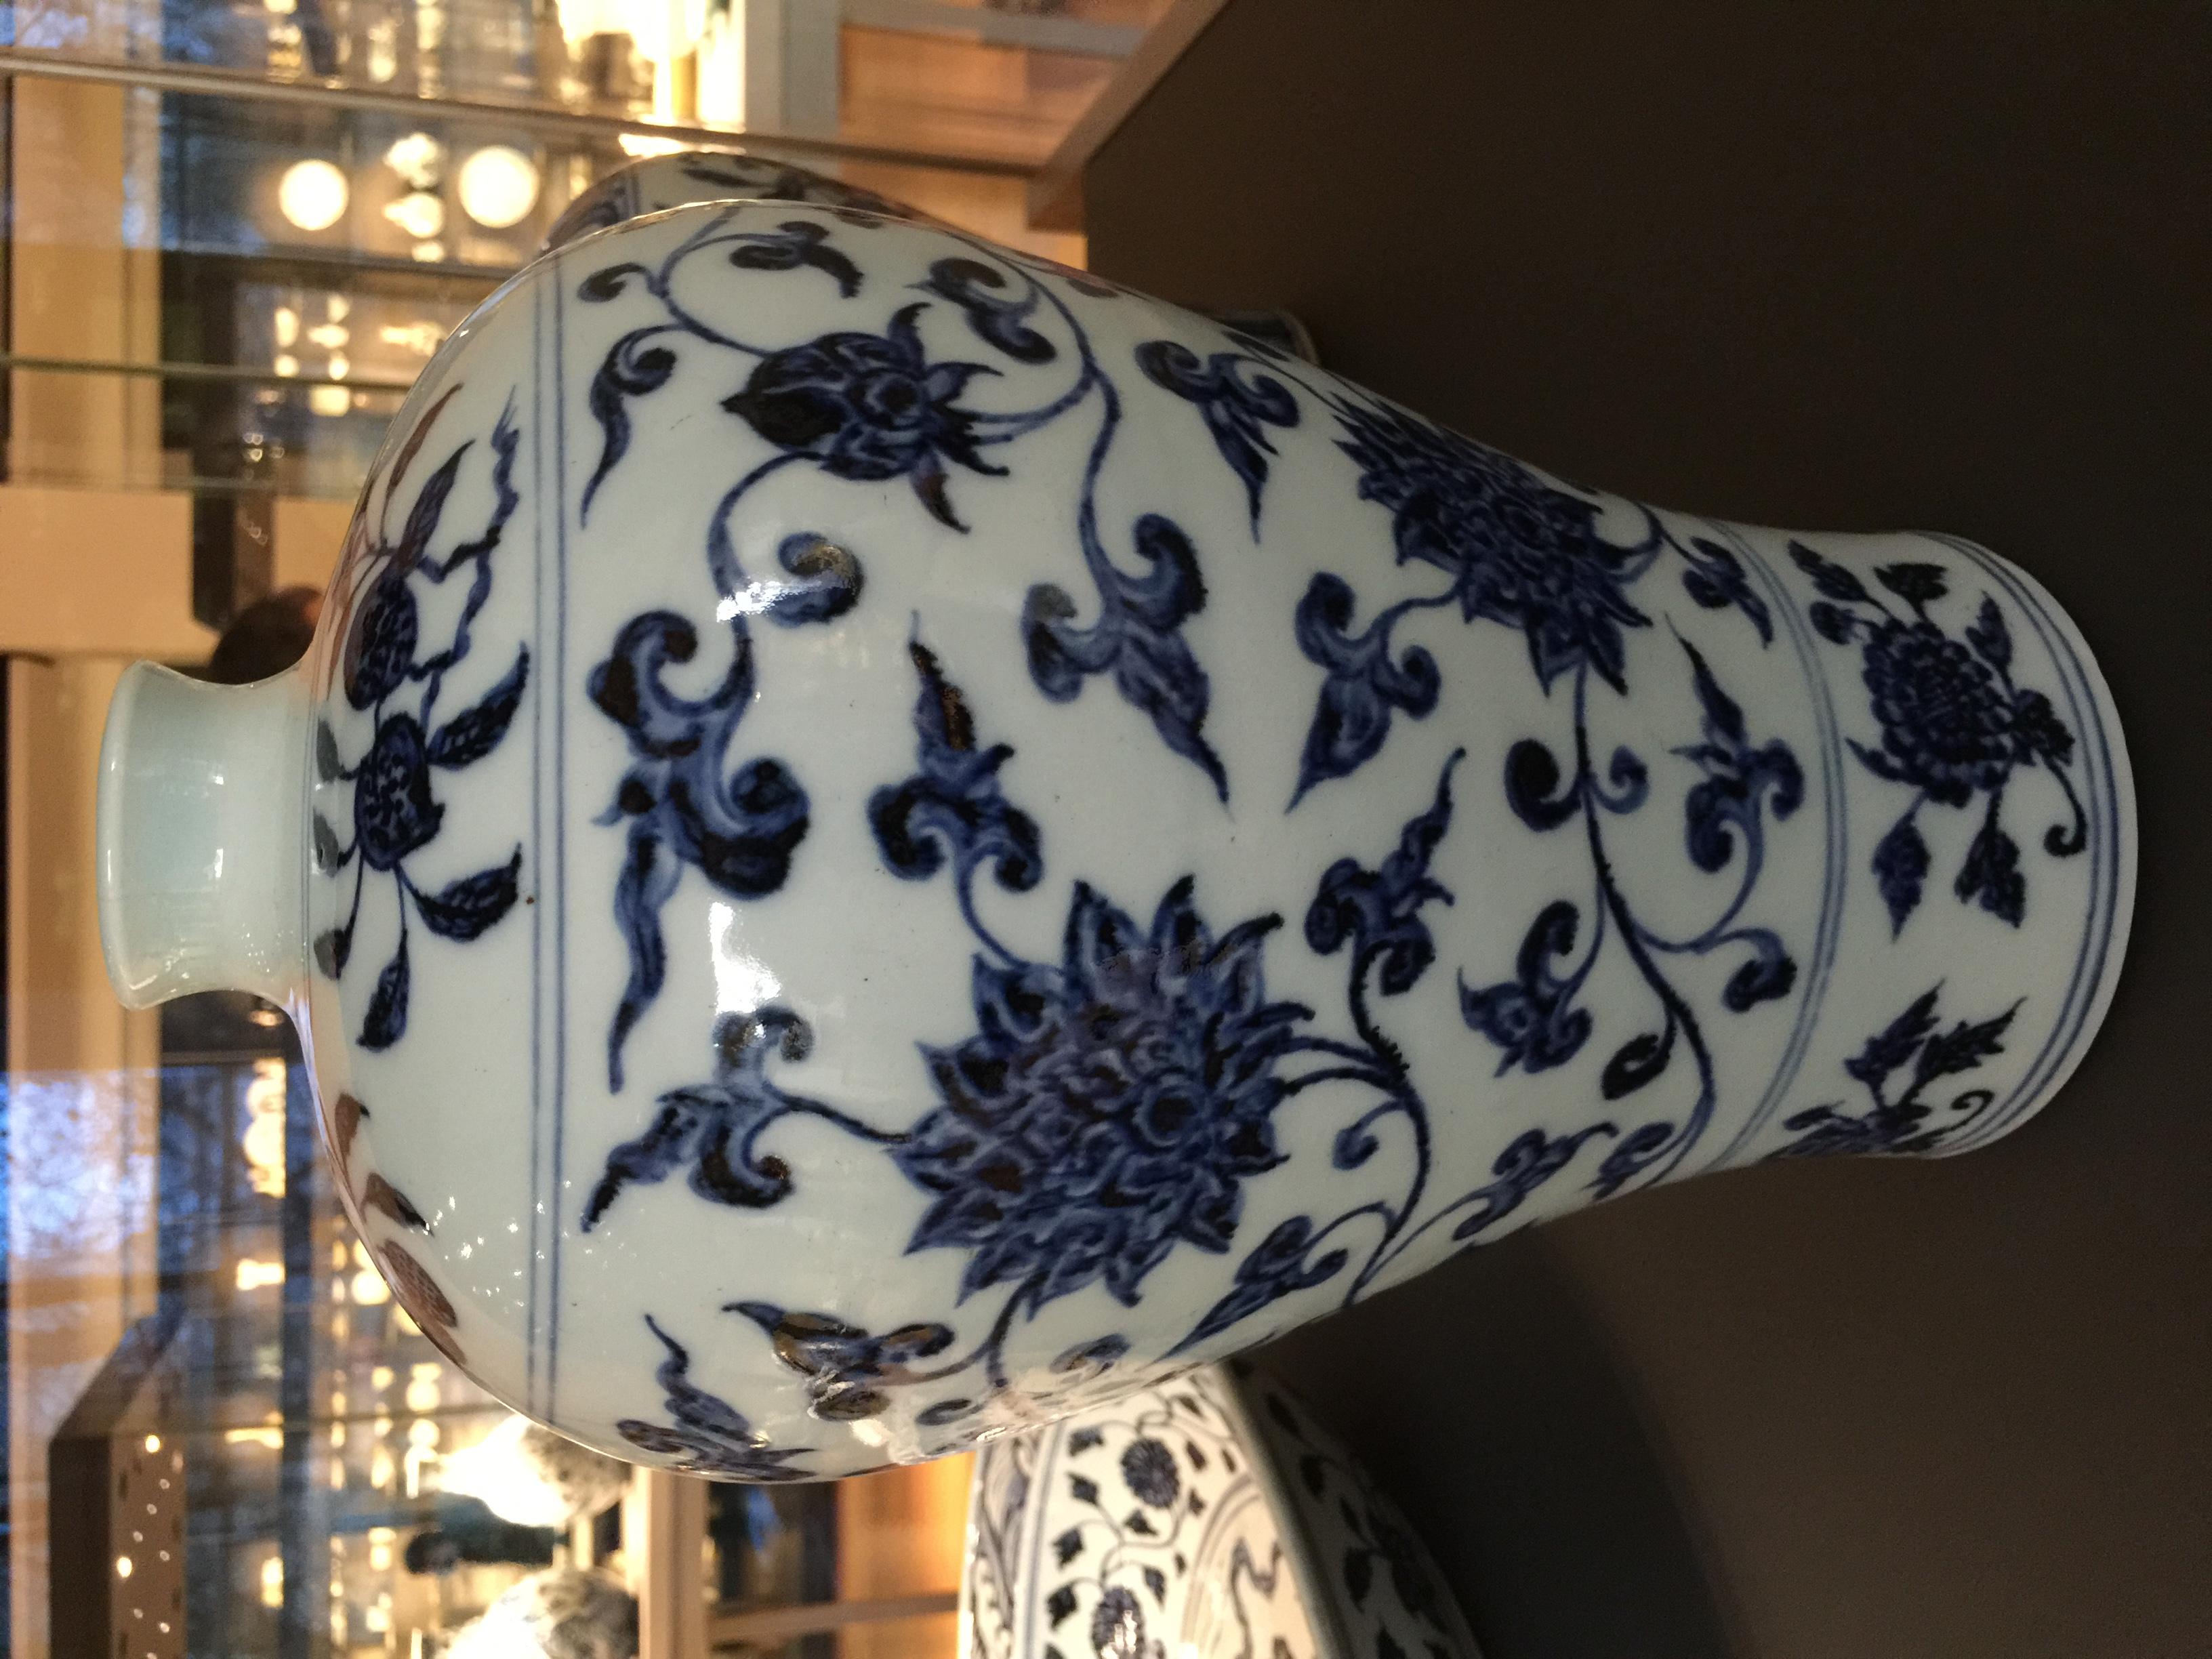 Chinese-Porcelain-British-Museum-Percival-David-jessewaugh.com-71.jpg